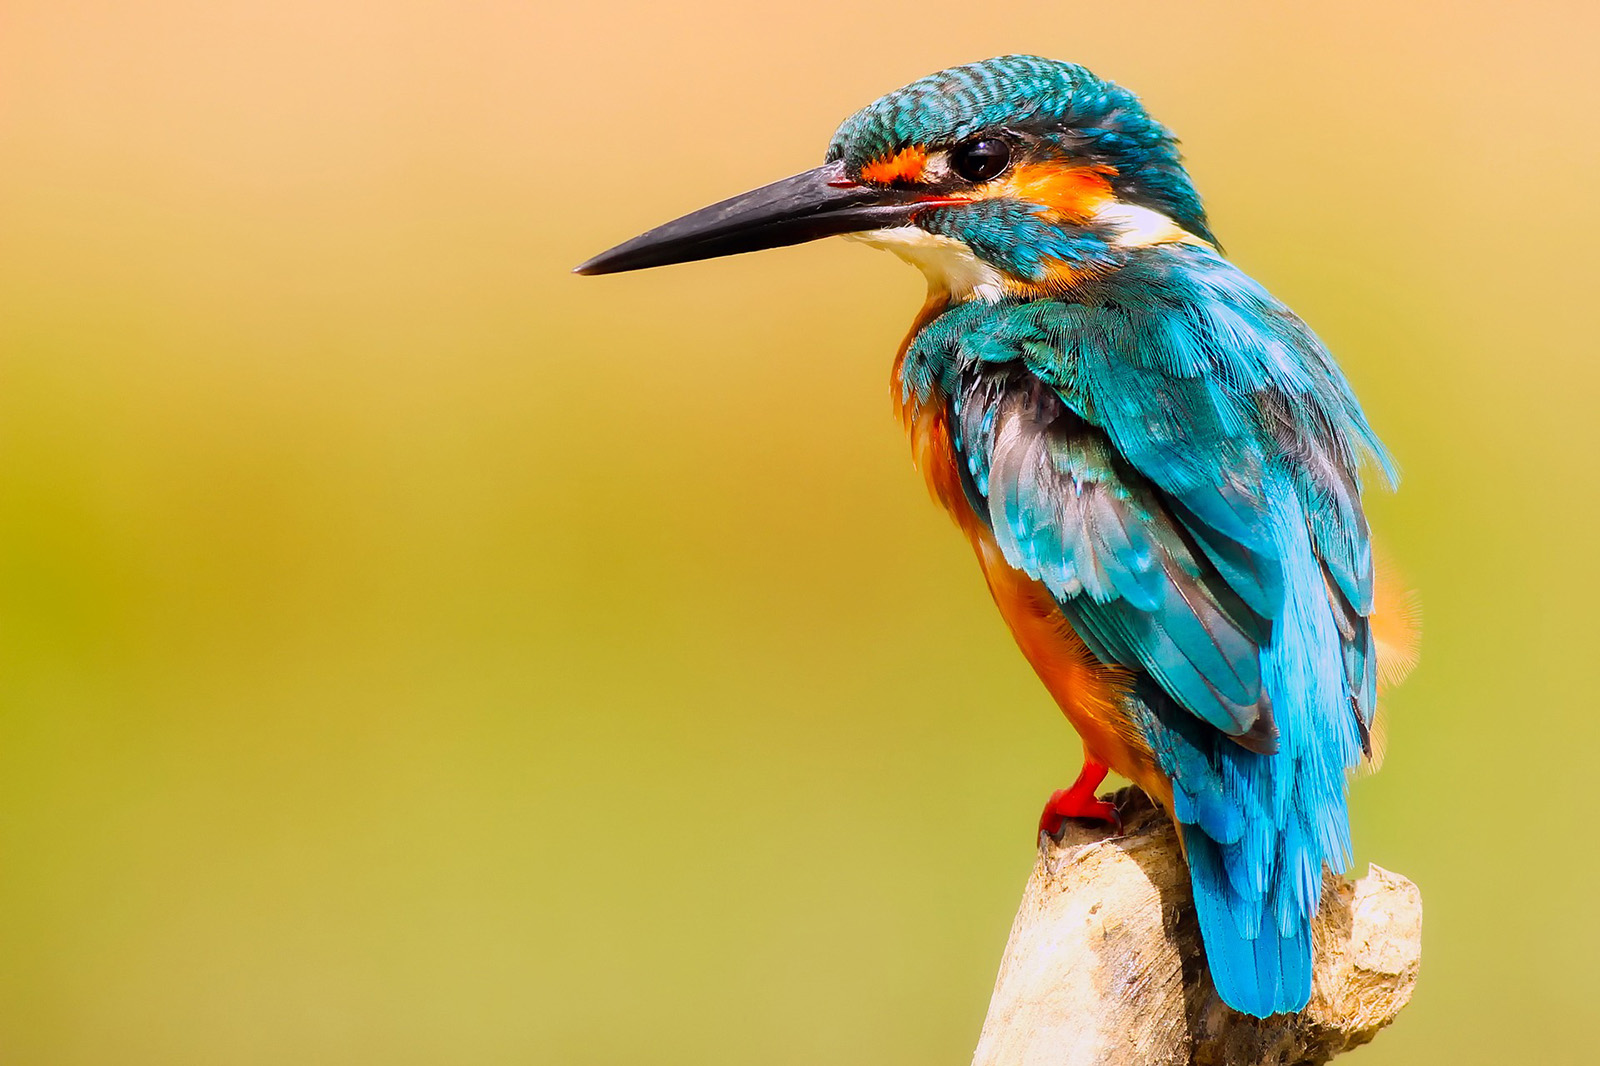 kingfisher-2046453_1920_g